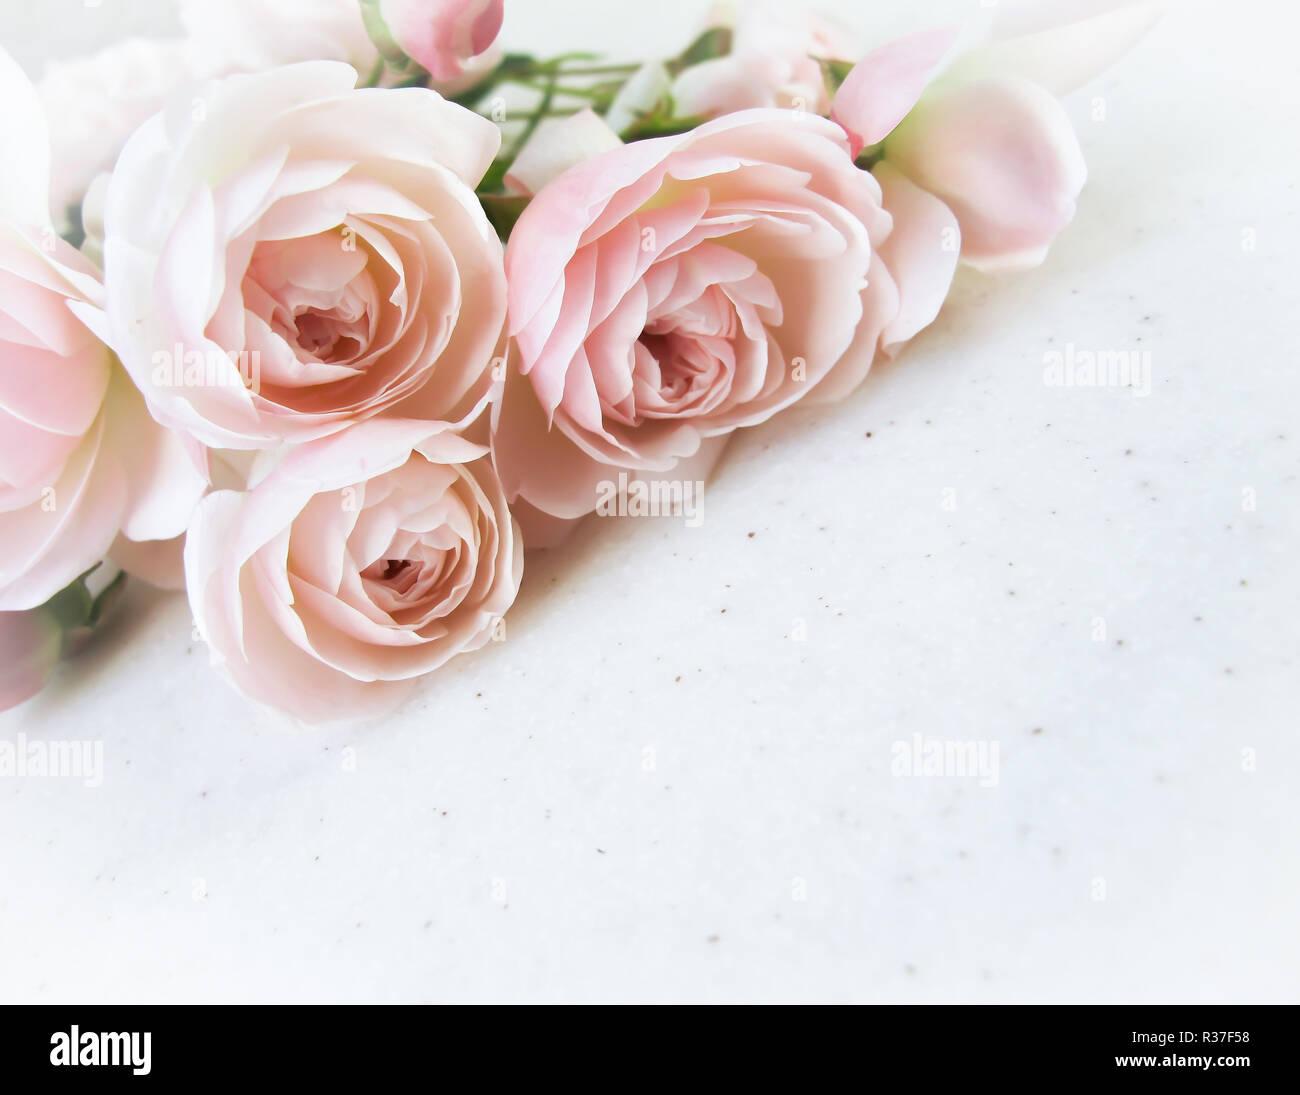 Rosas Rosas Aislado Sobre Fondo Blanco Perfecto Para